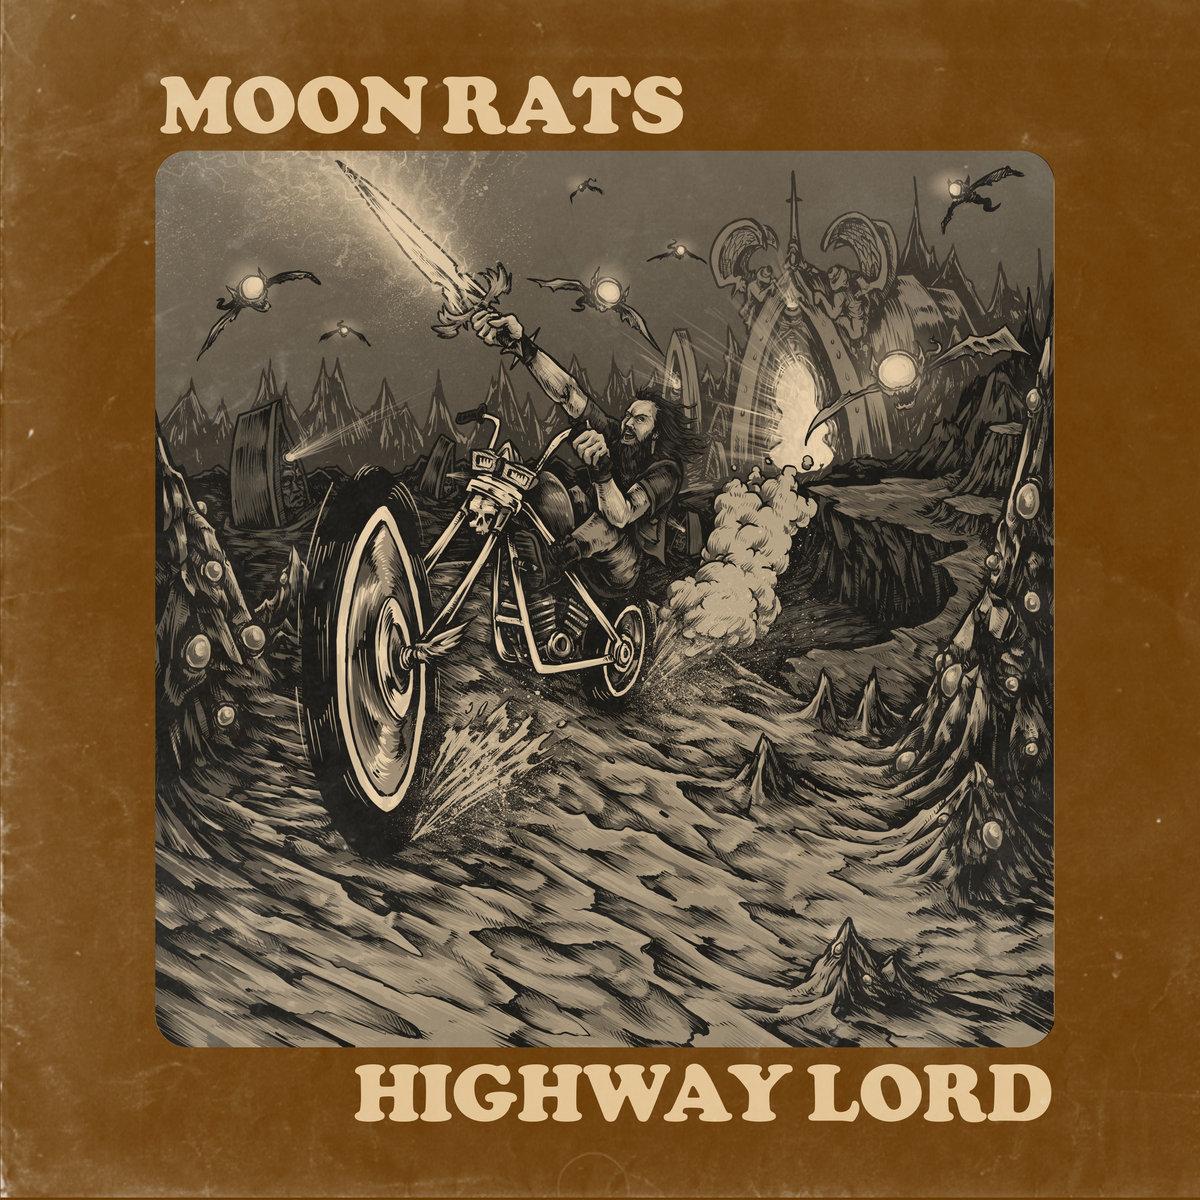 GLS027 - Moon Rats - Highway Lord